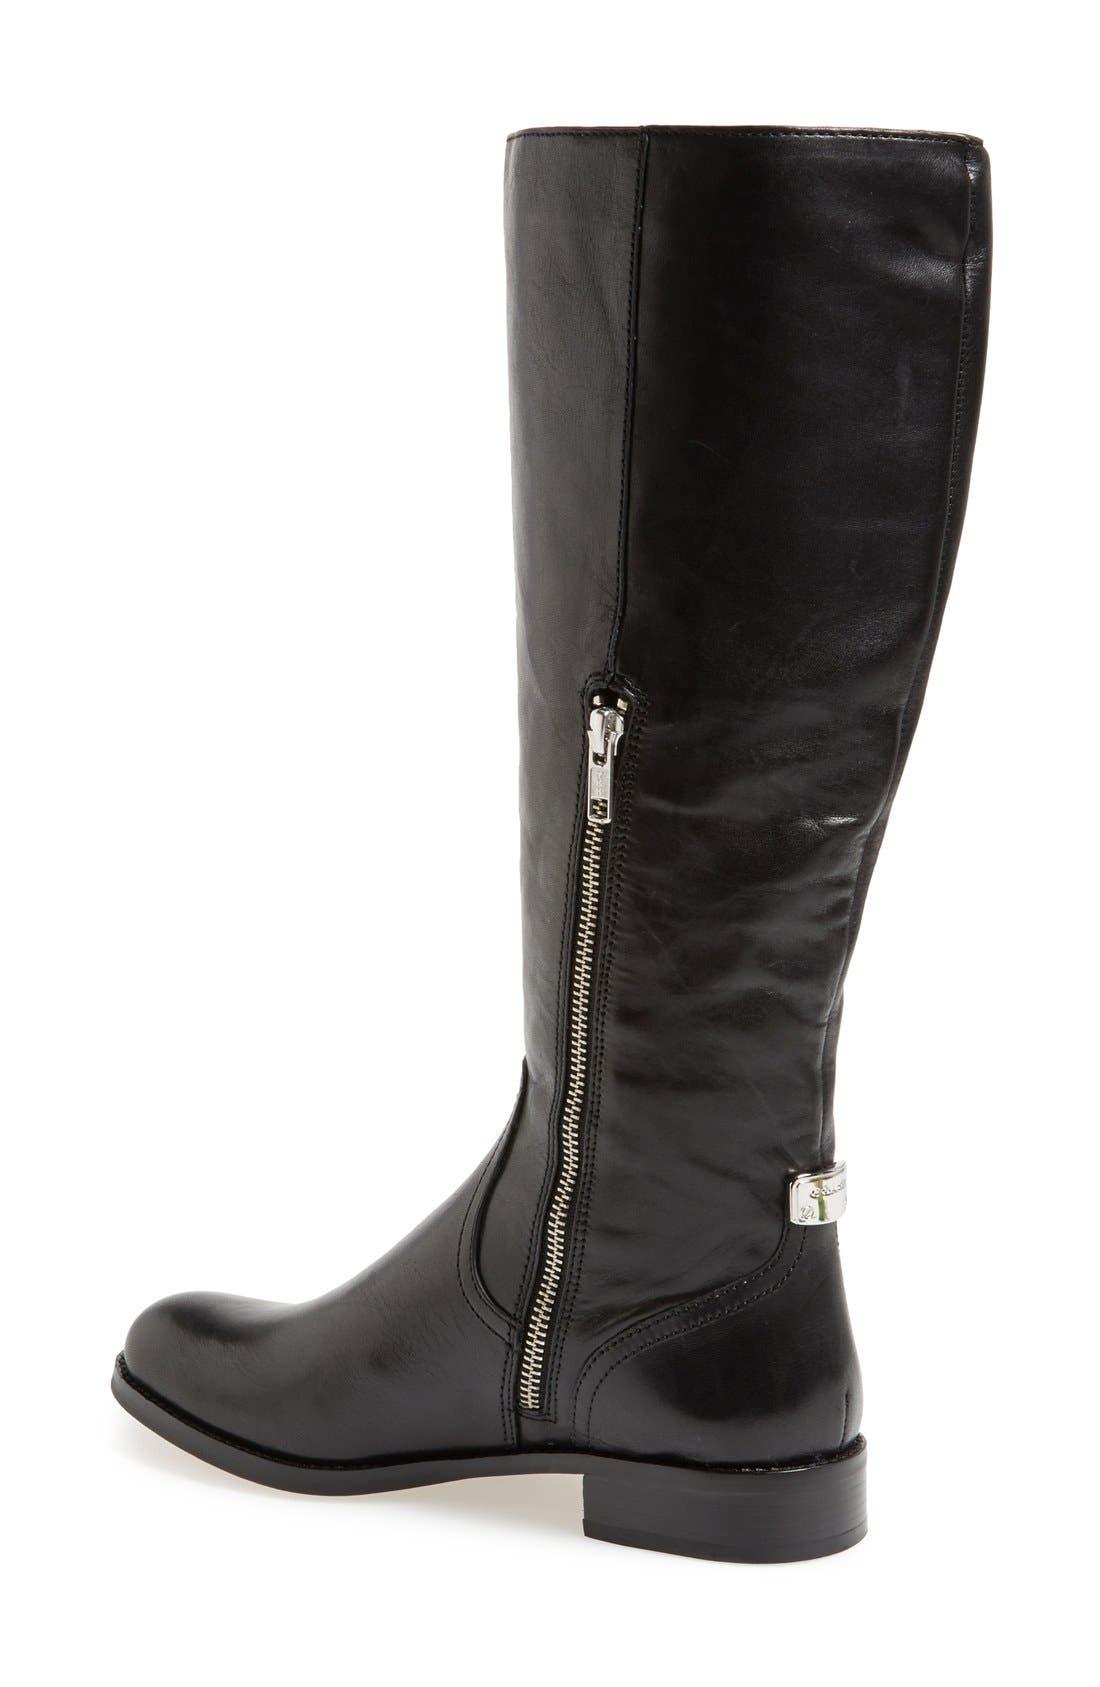 Alternate Image 3  - COACH 'Mirriam' Leather Riding Boot (Women)